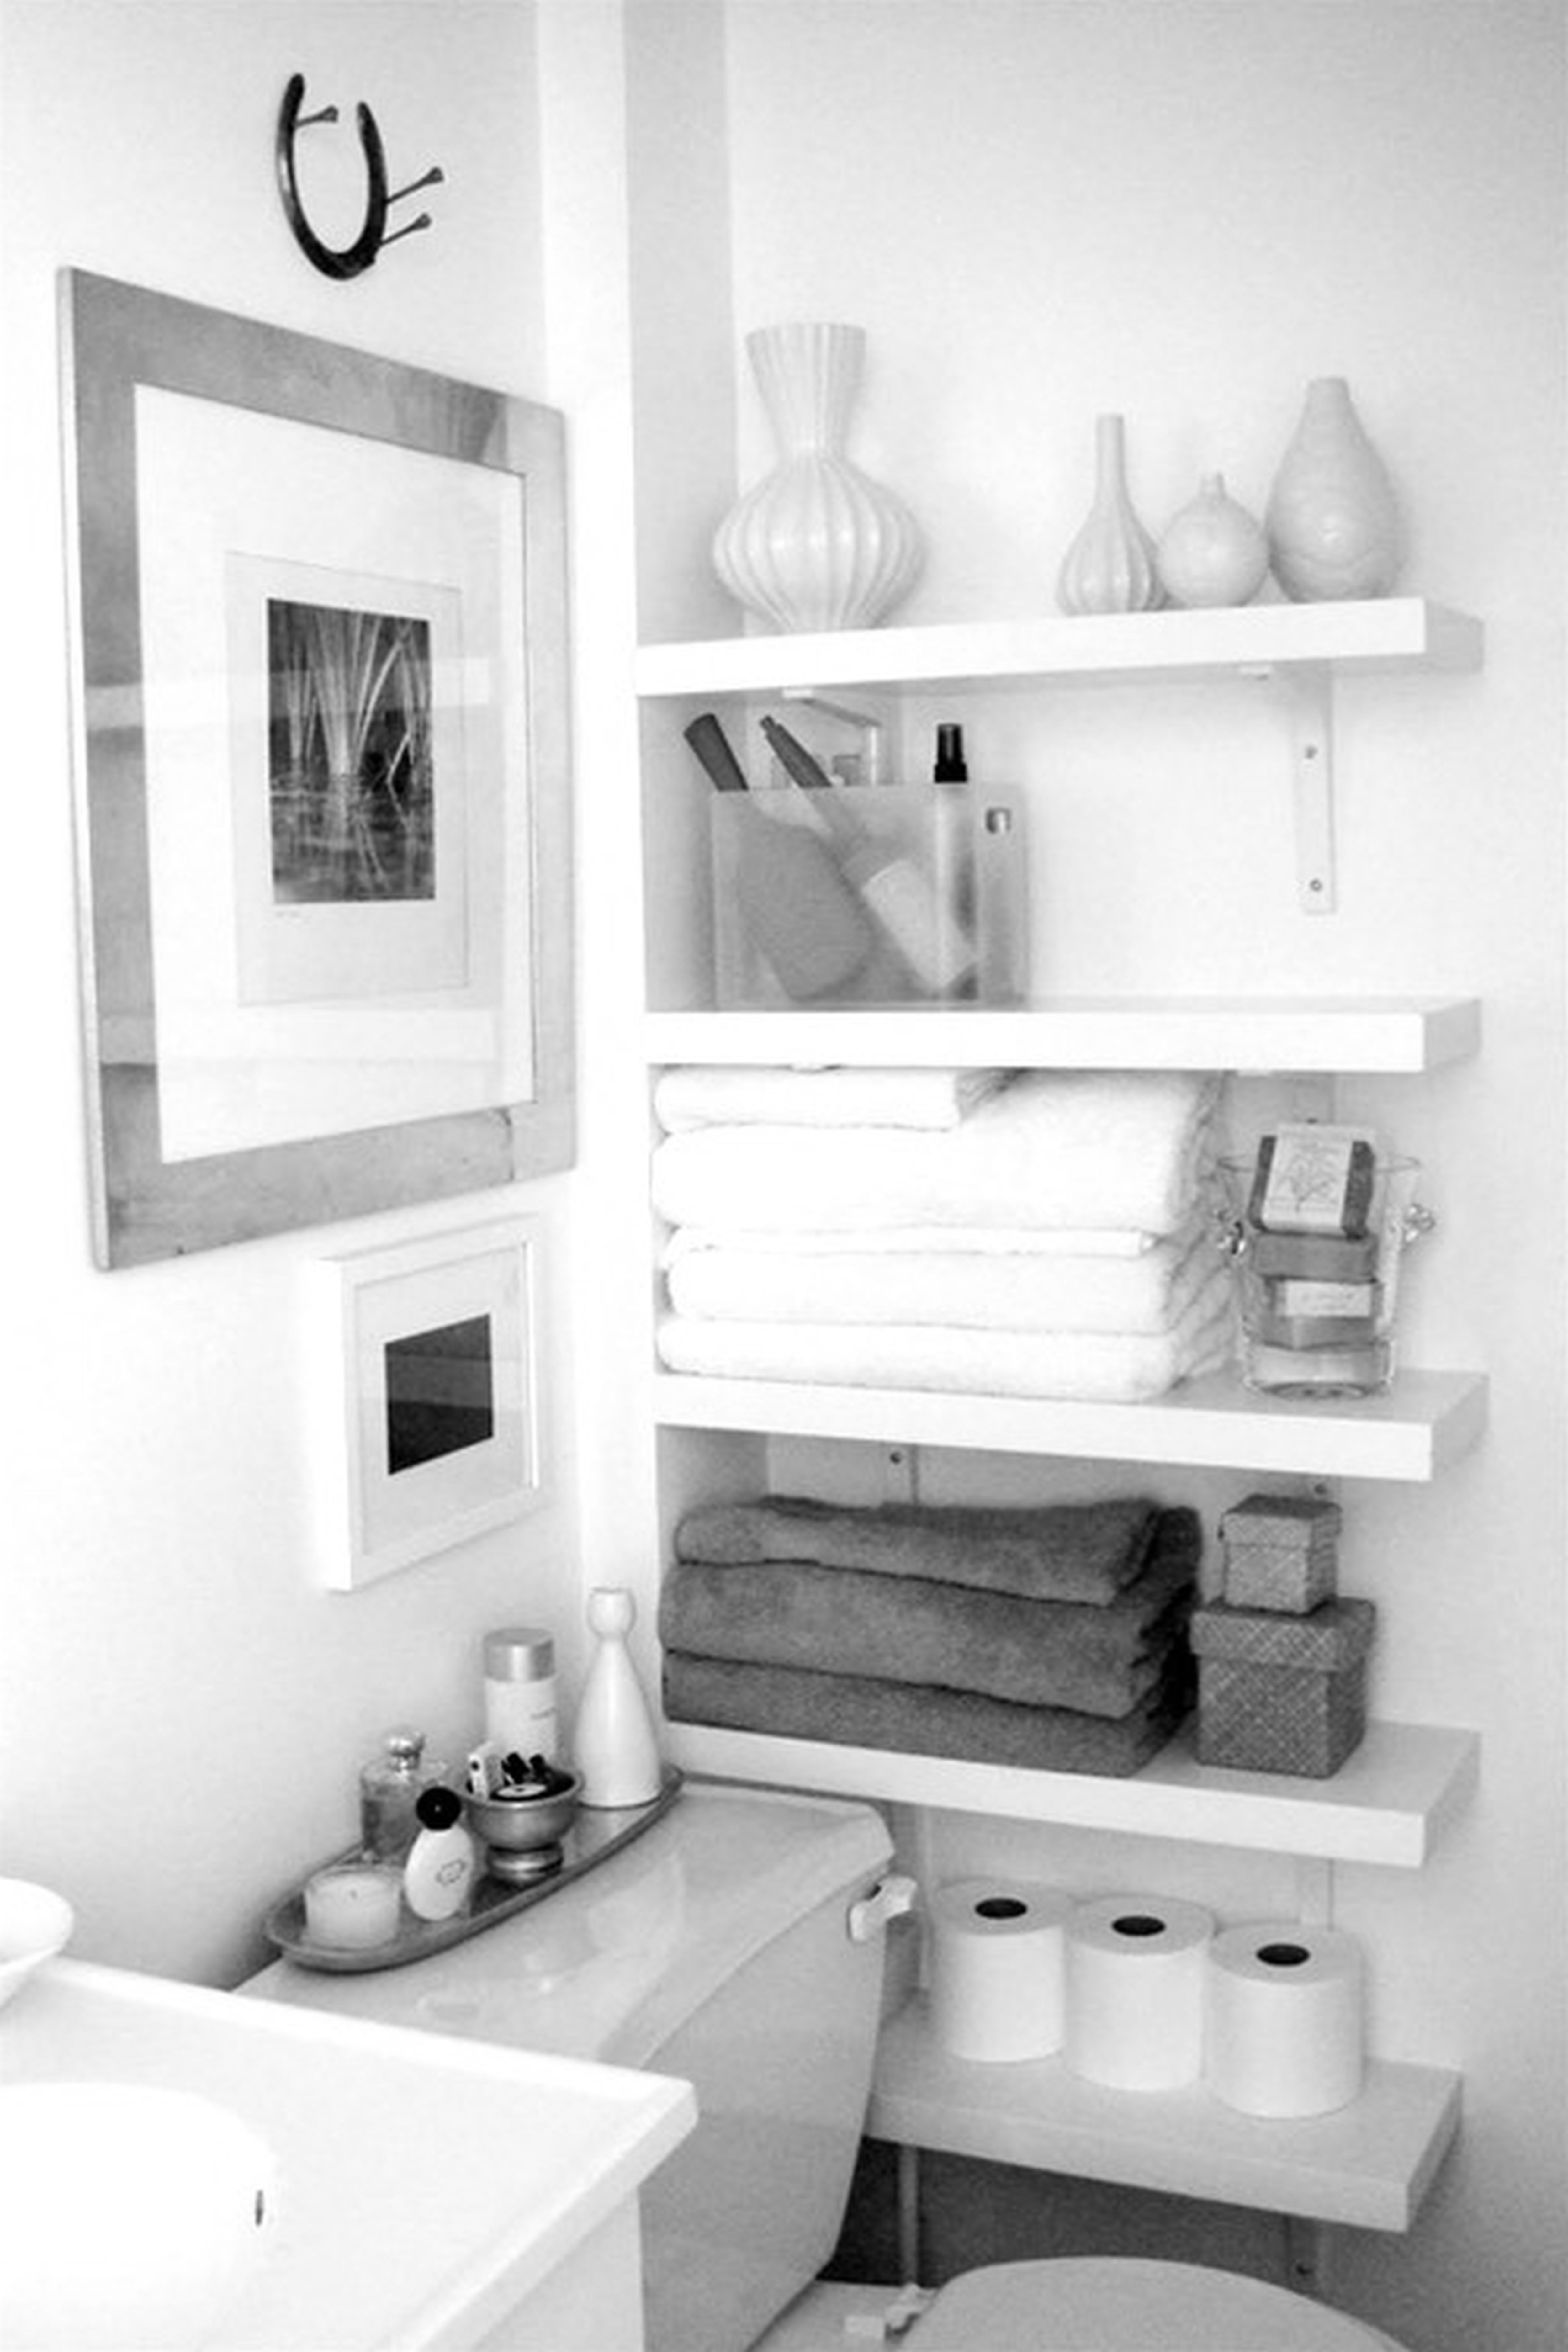 Awesome white hardwood floating shelves as corner bathroom